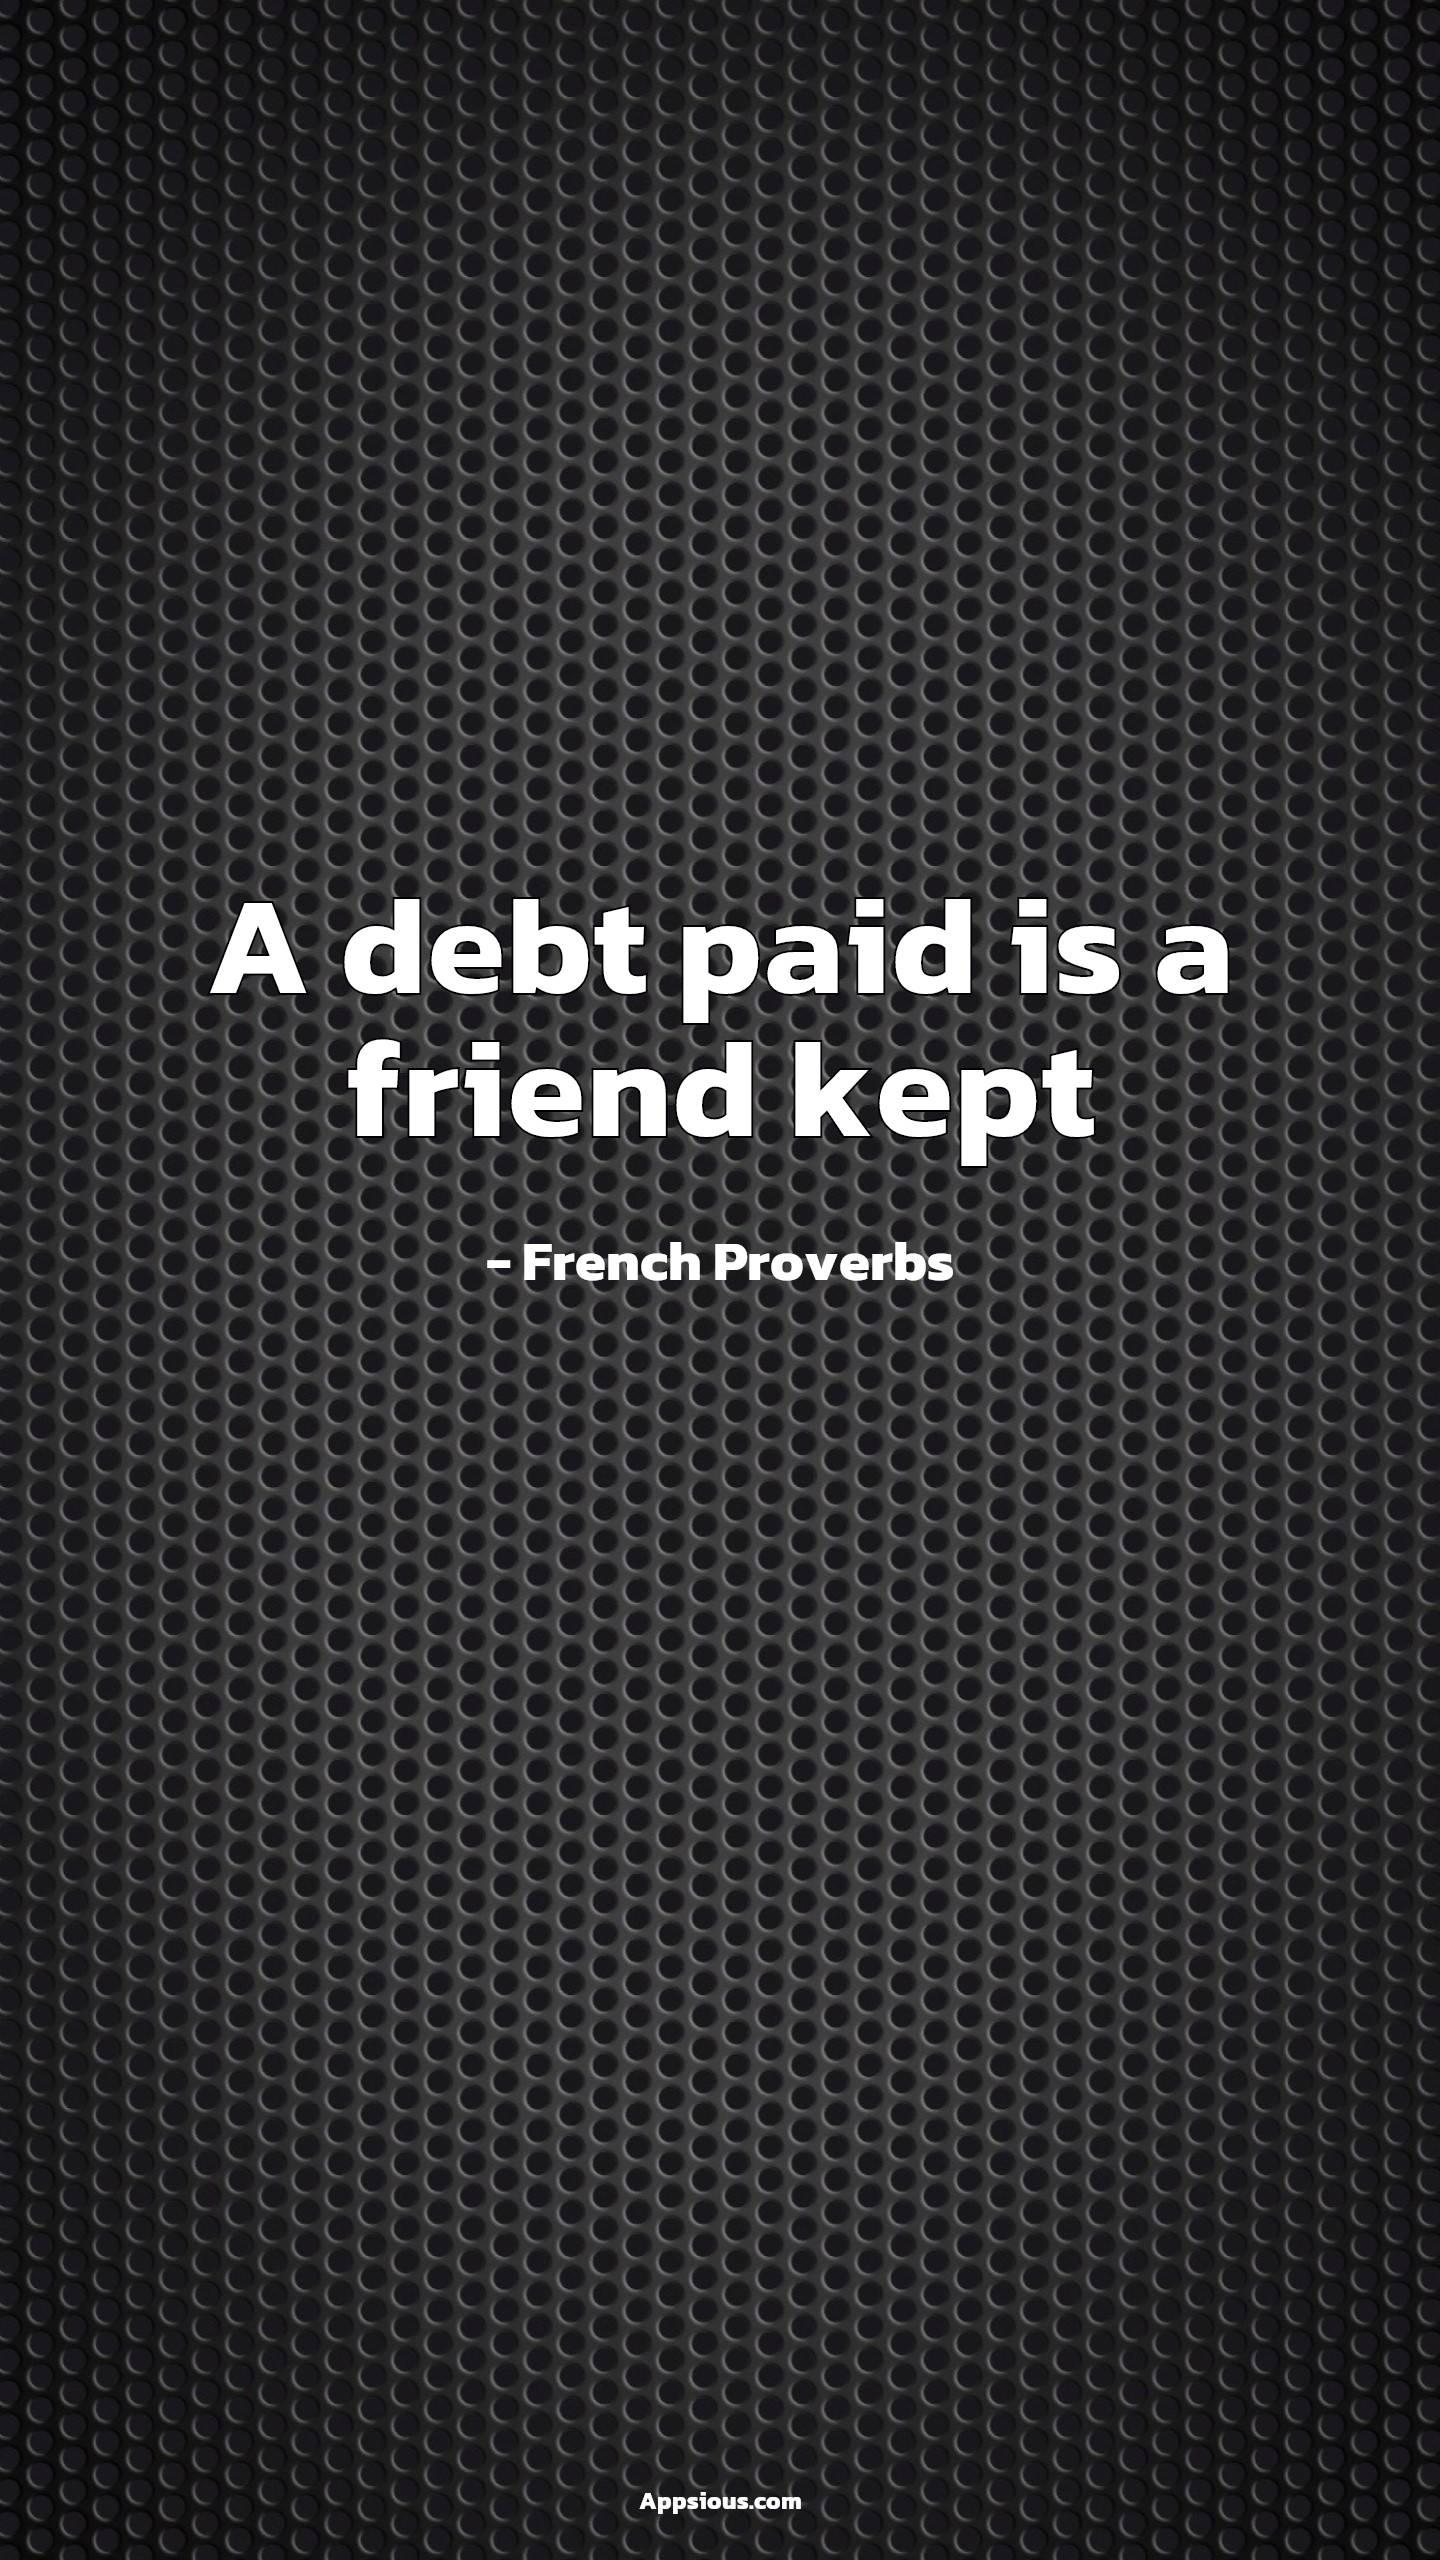 A debt paid is a friend kept